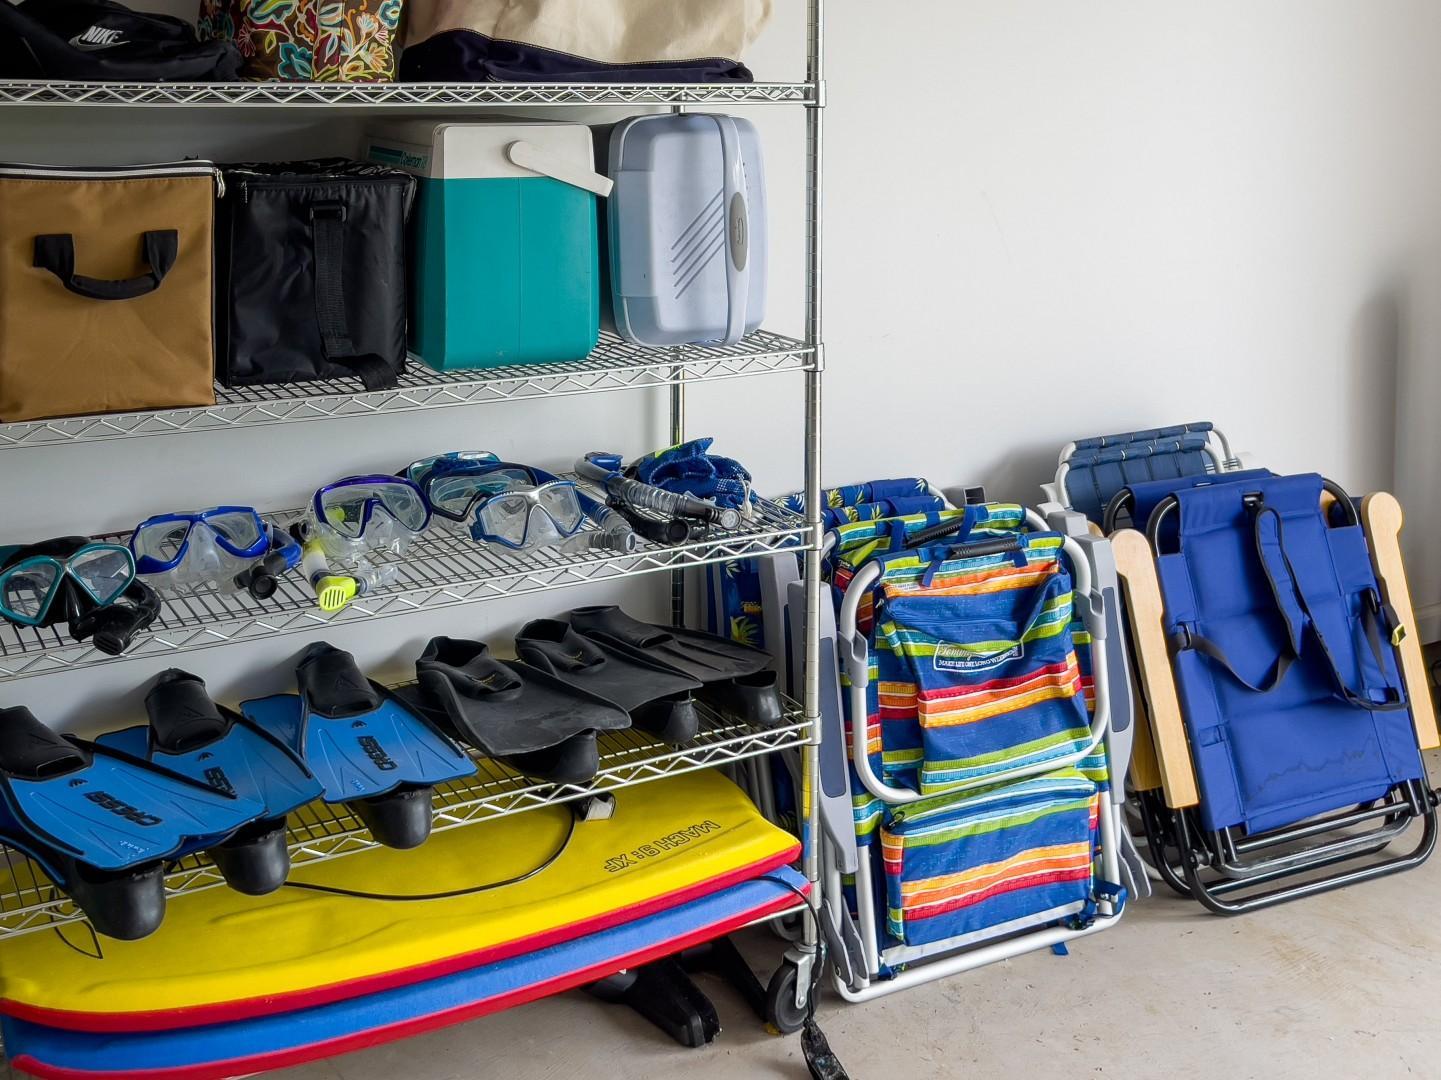 Generous Supply of Beach Gear in the Garage